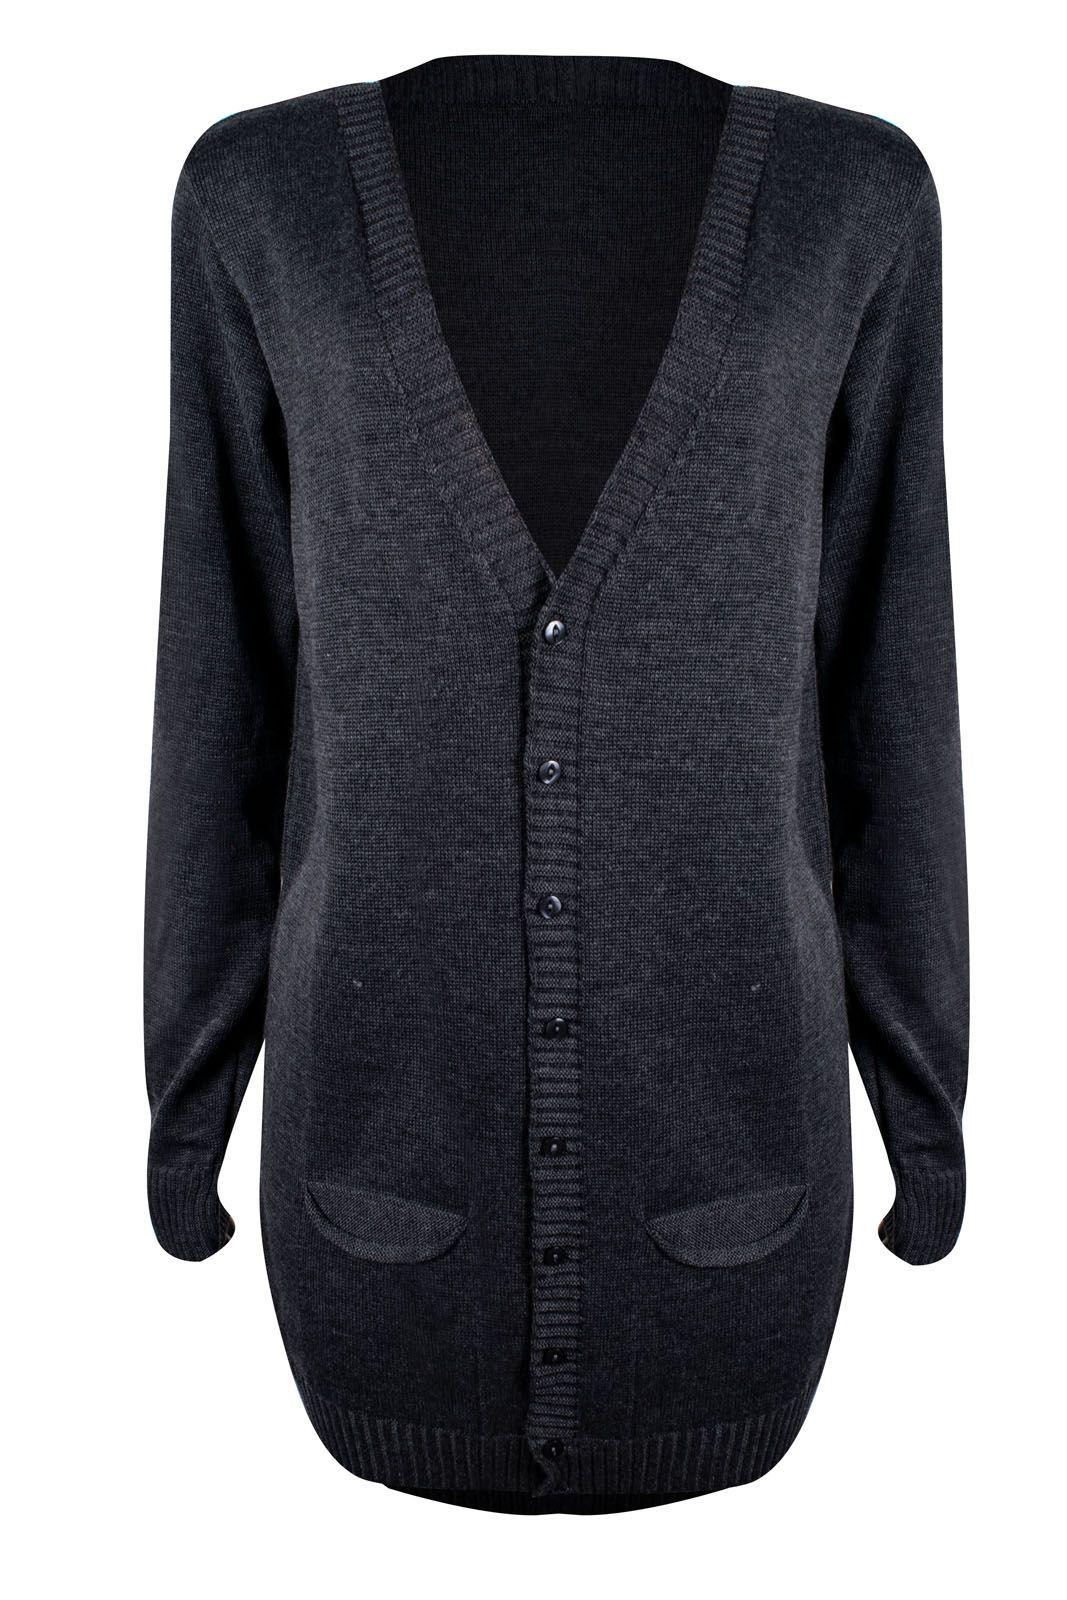 Cardigan Outlet Dri Kimono Longo Tricot Bolso Frontal 8 Botões Cinza